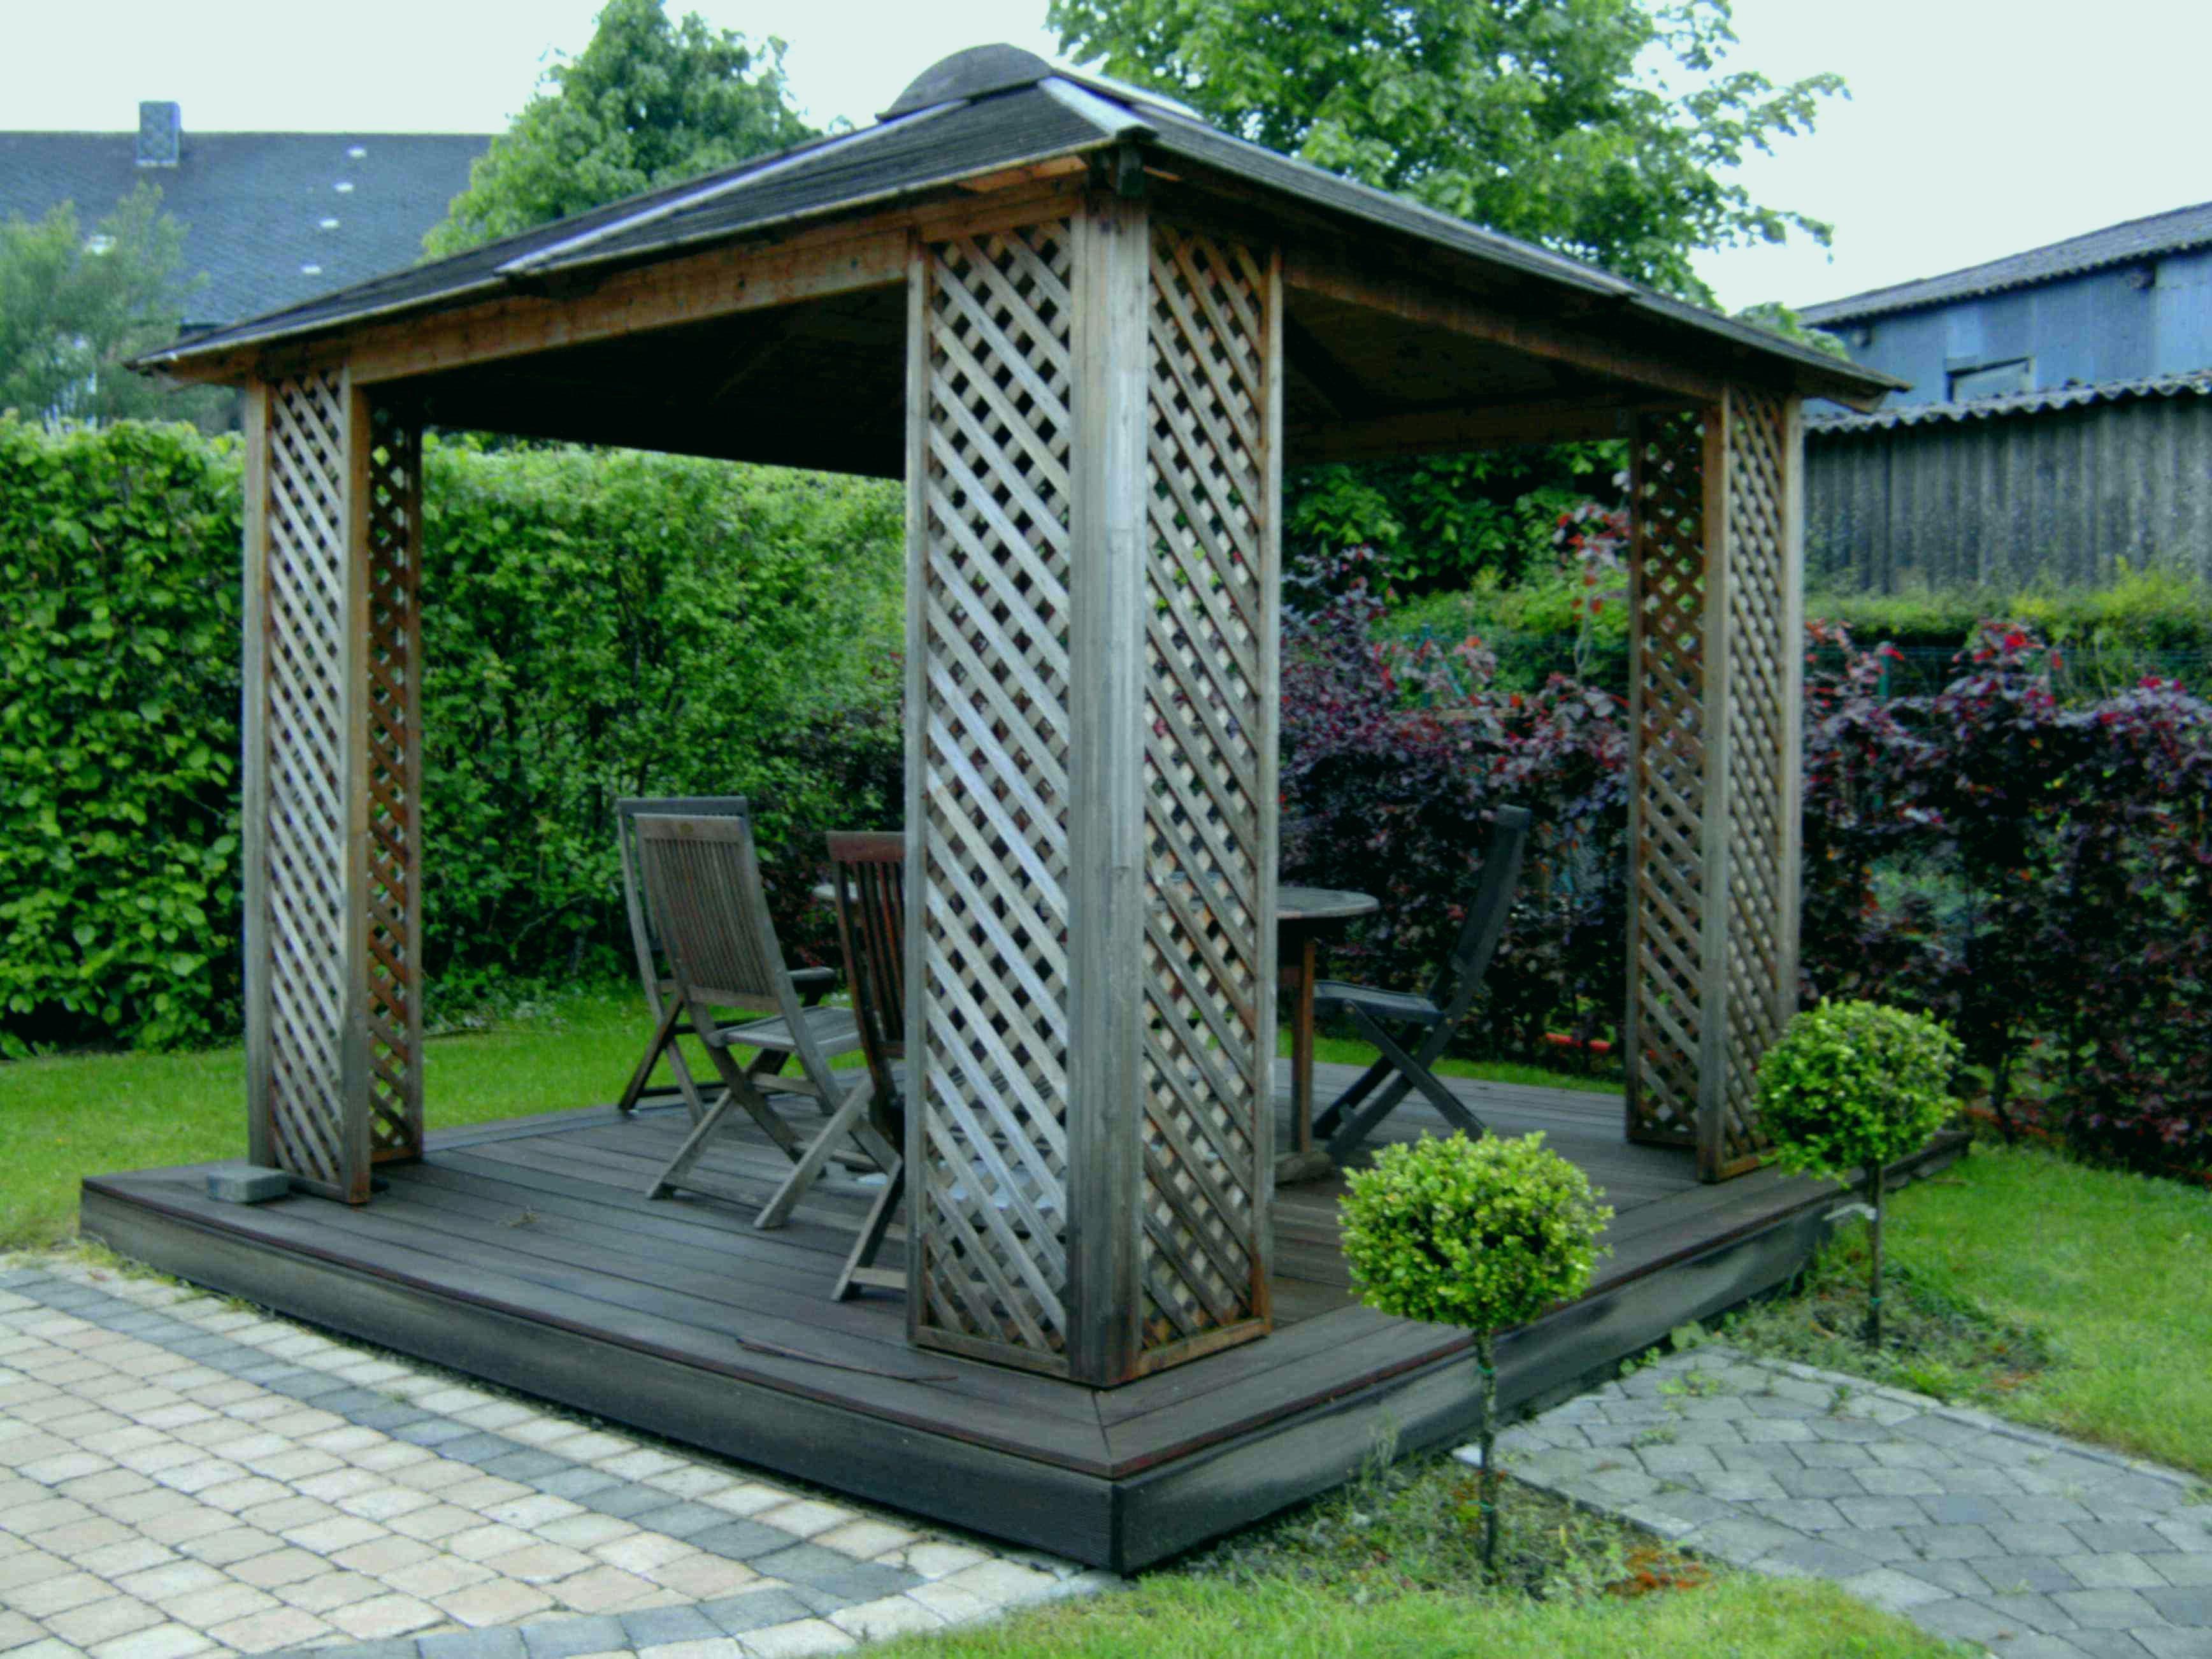 Abri De Jardin Gifi Beau Photos Construire Pergola Bois Impressionnant Fabriquer Un Abri De Jardin